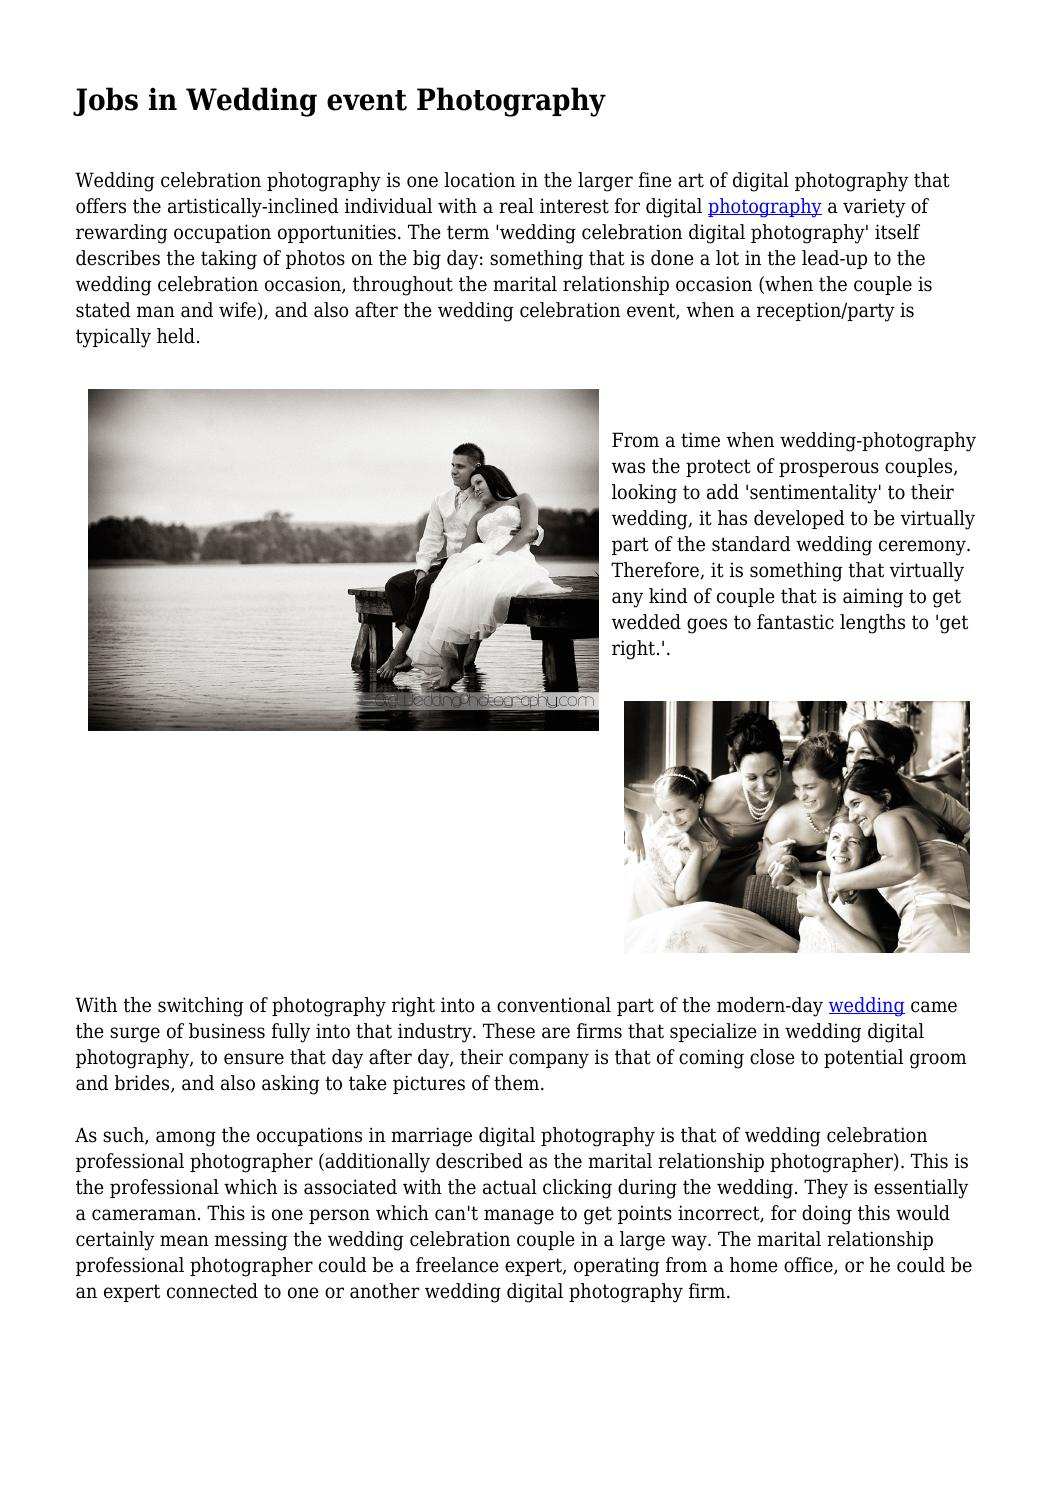 Jobs in Wedding event Photography by carissa7osborne7 - issuu